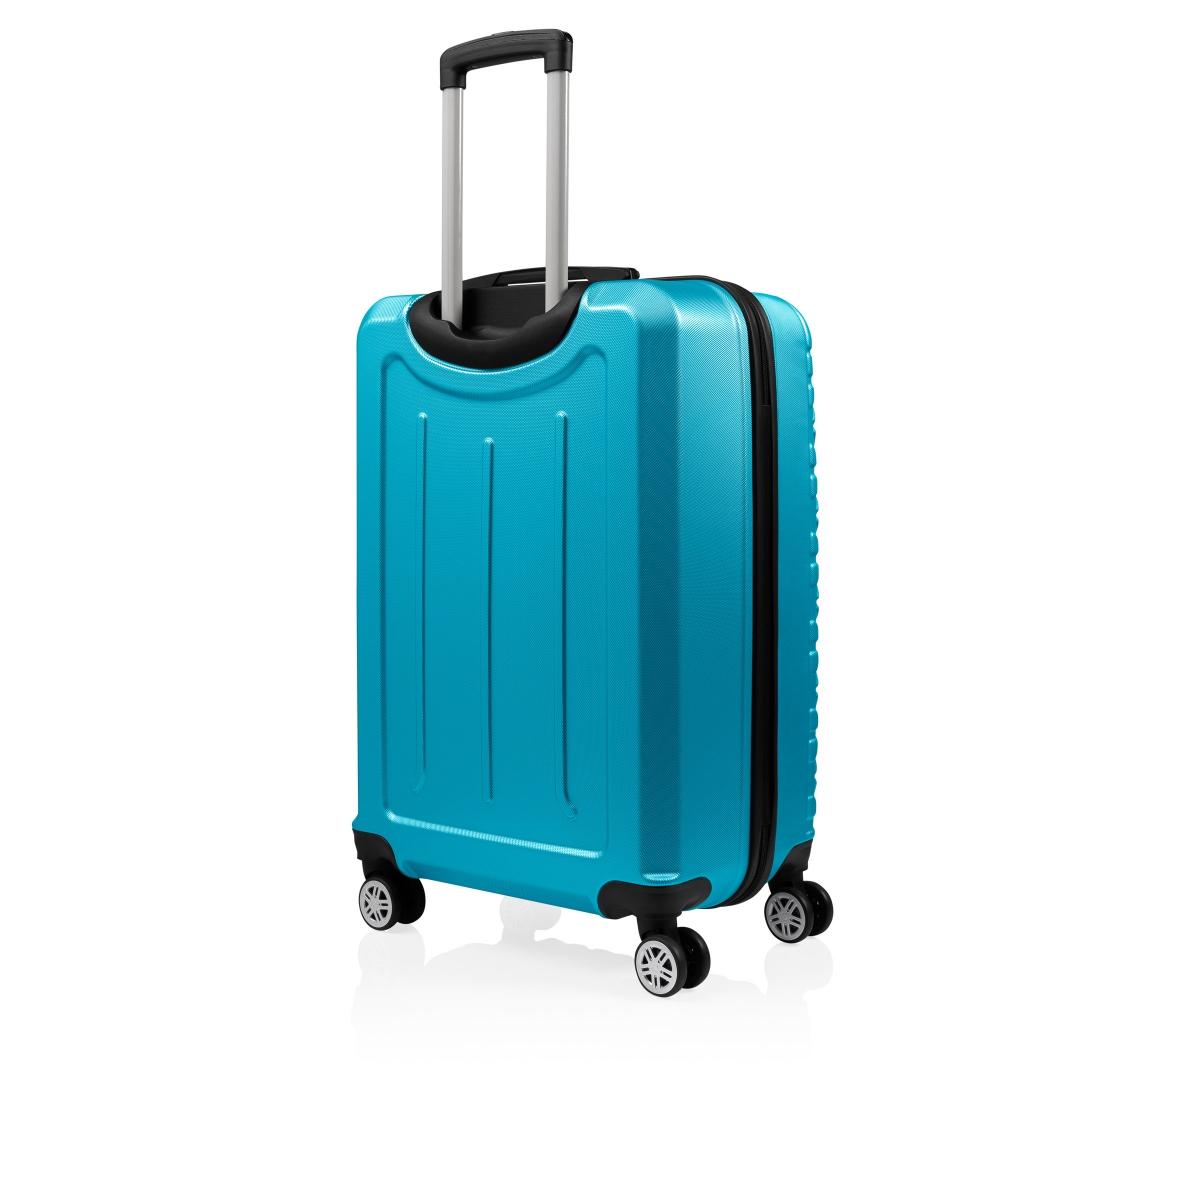 Gedox Abs 3'lü Valiz Seyahat Seti - Model:800.16 Turkuaz